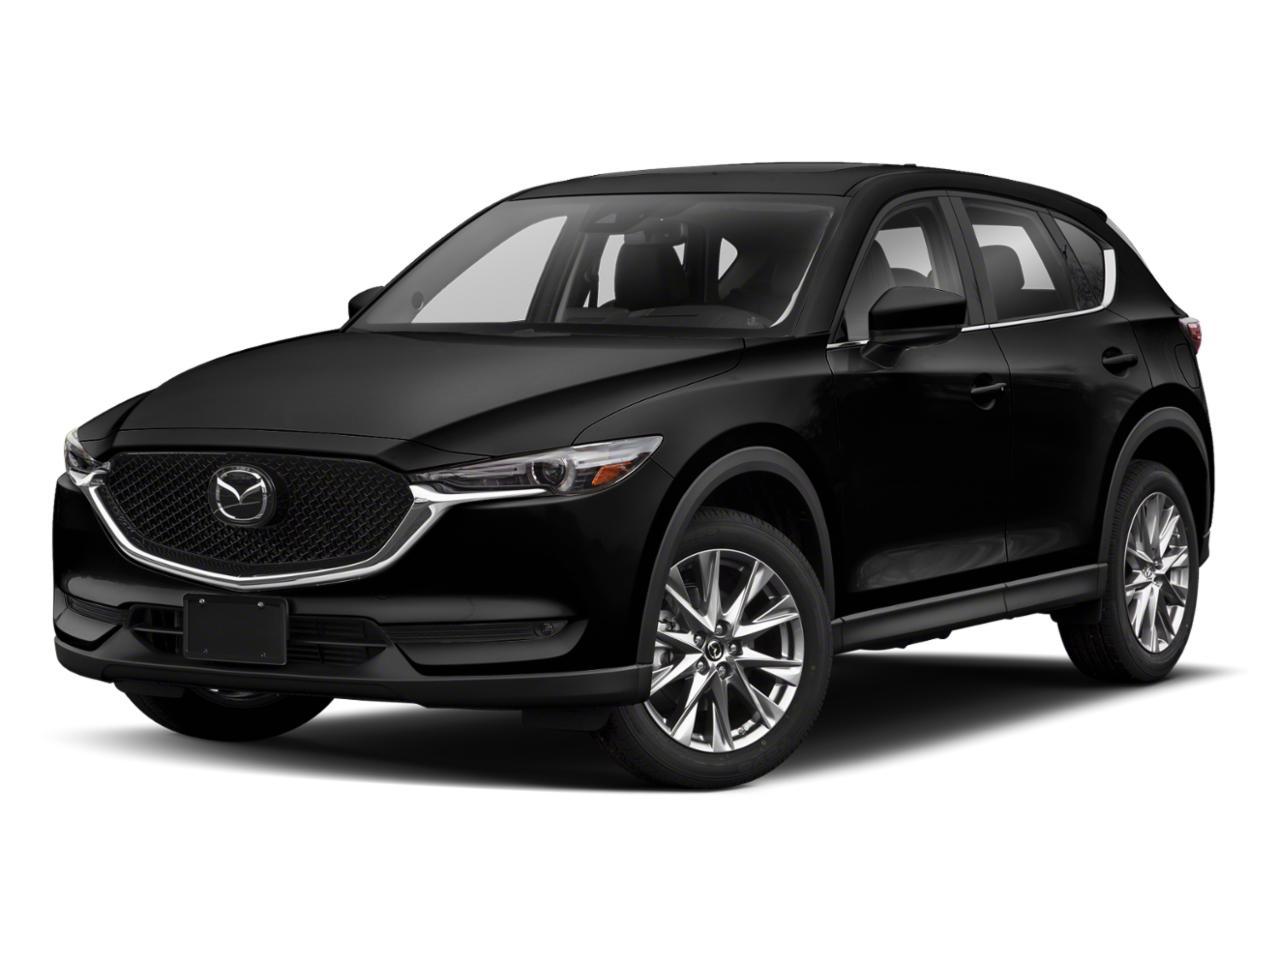 2020 Mazda CX-5 Vehicle Photo in Joliet, IL 60586